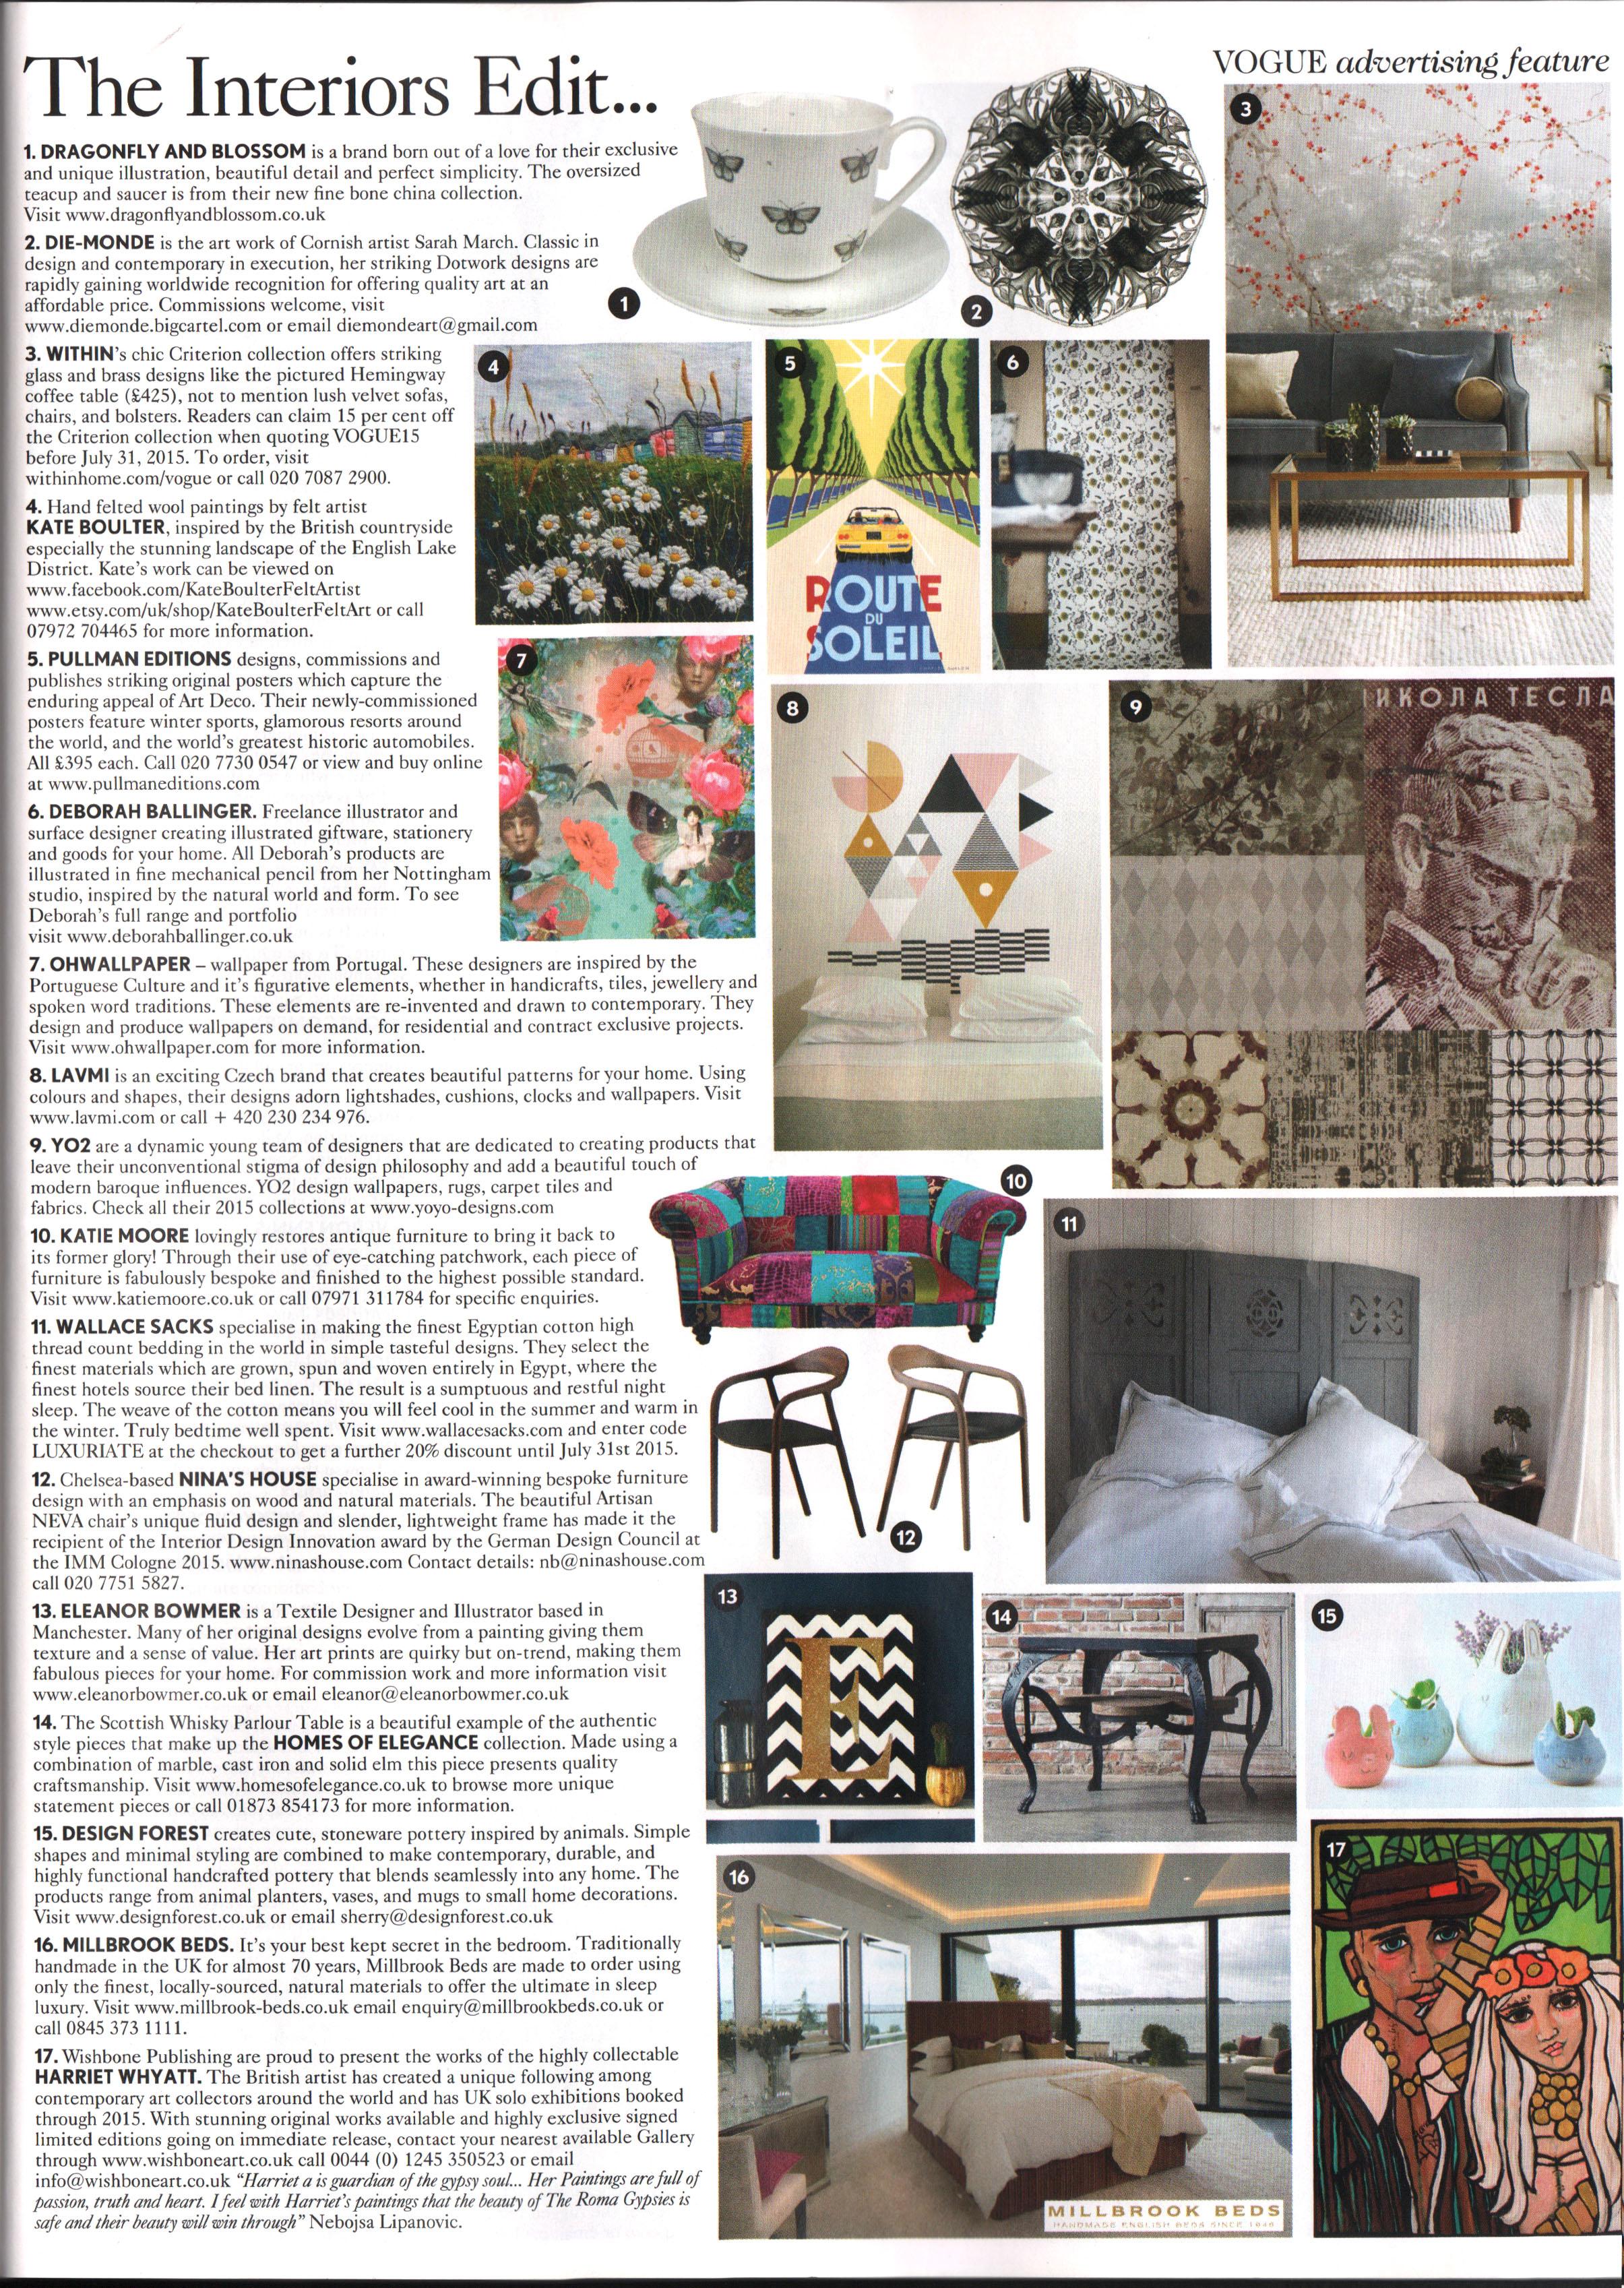 Vogue Interiors Edit, July 2015